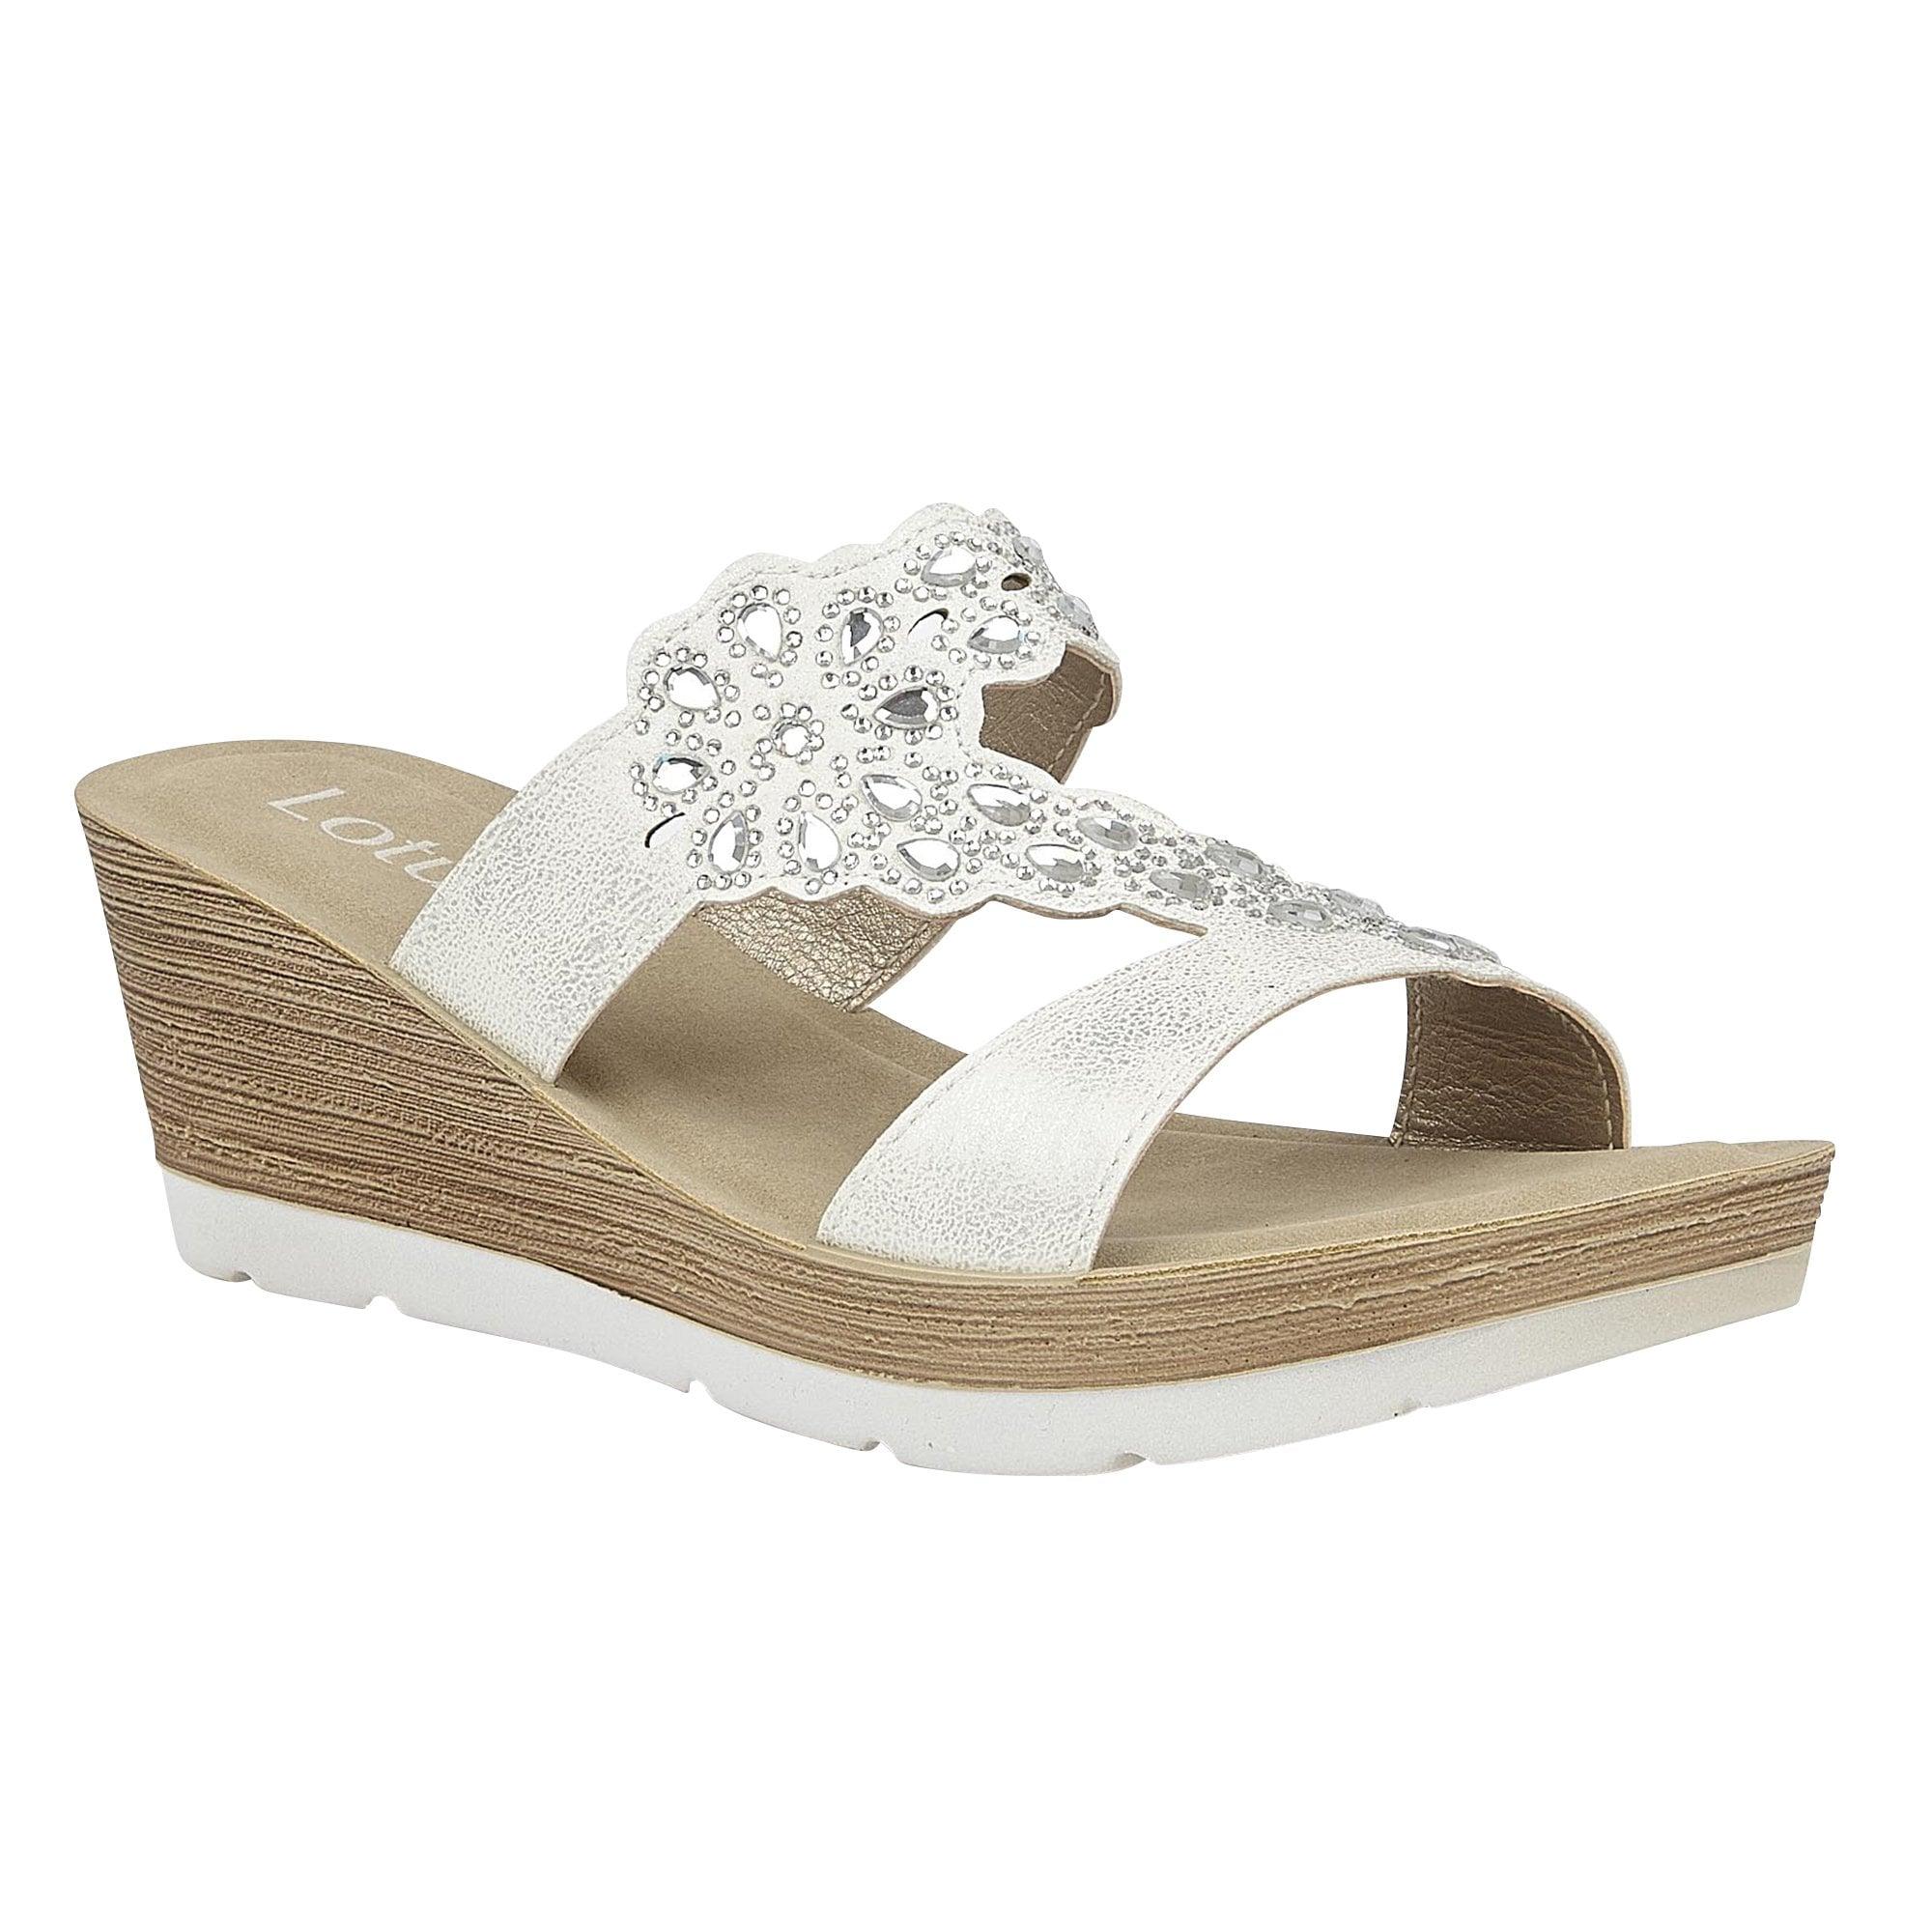 Lotus ladies' Catania sandal